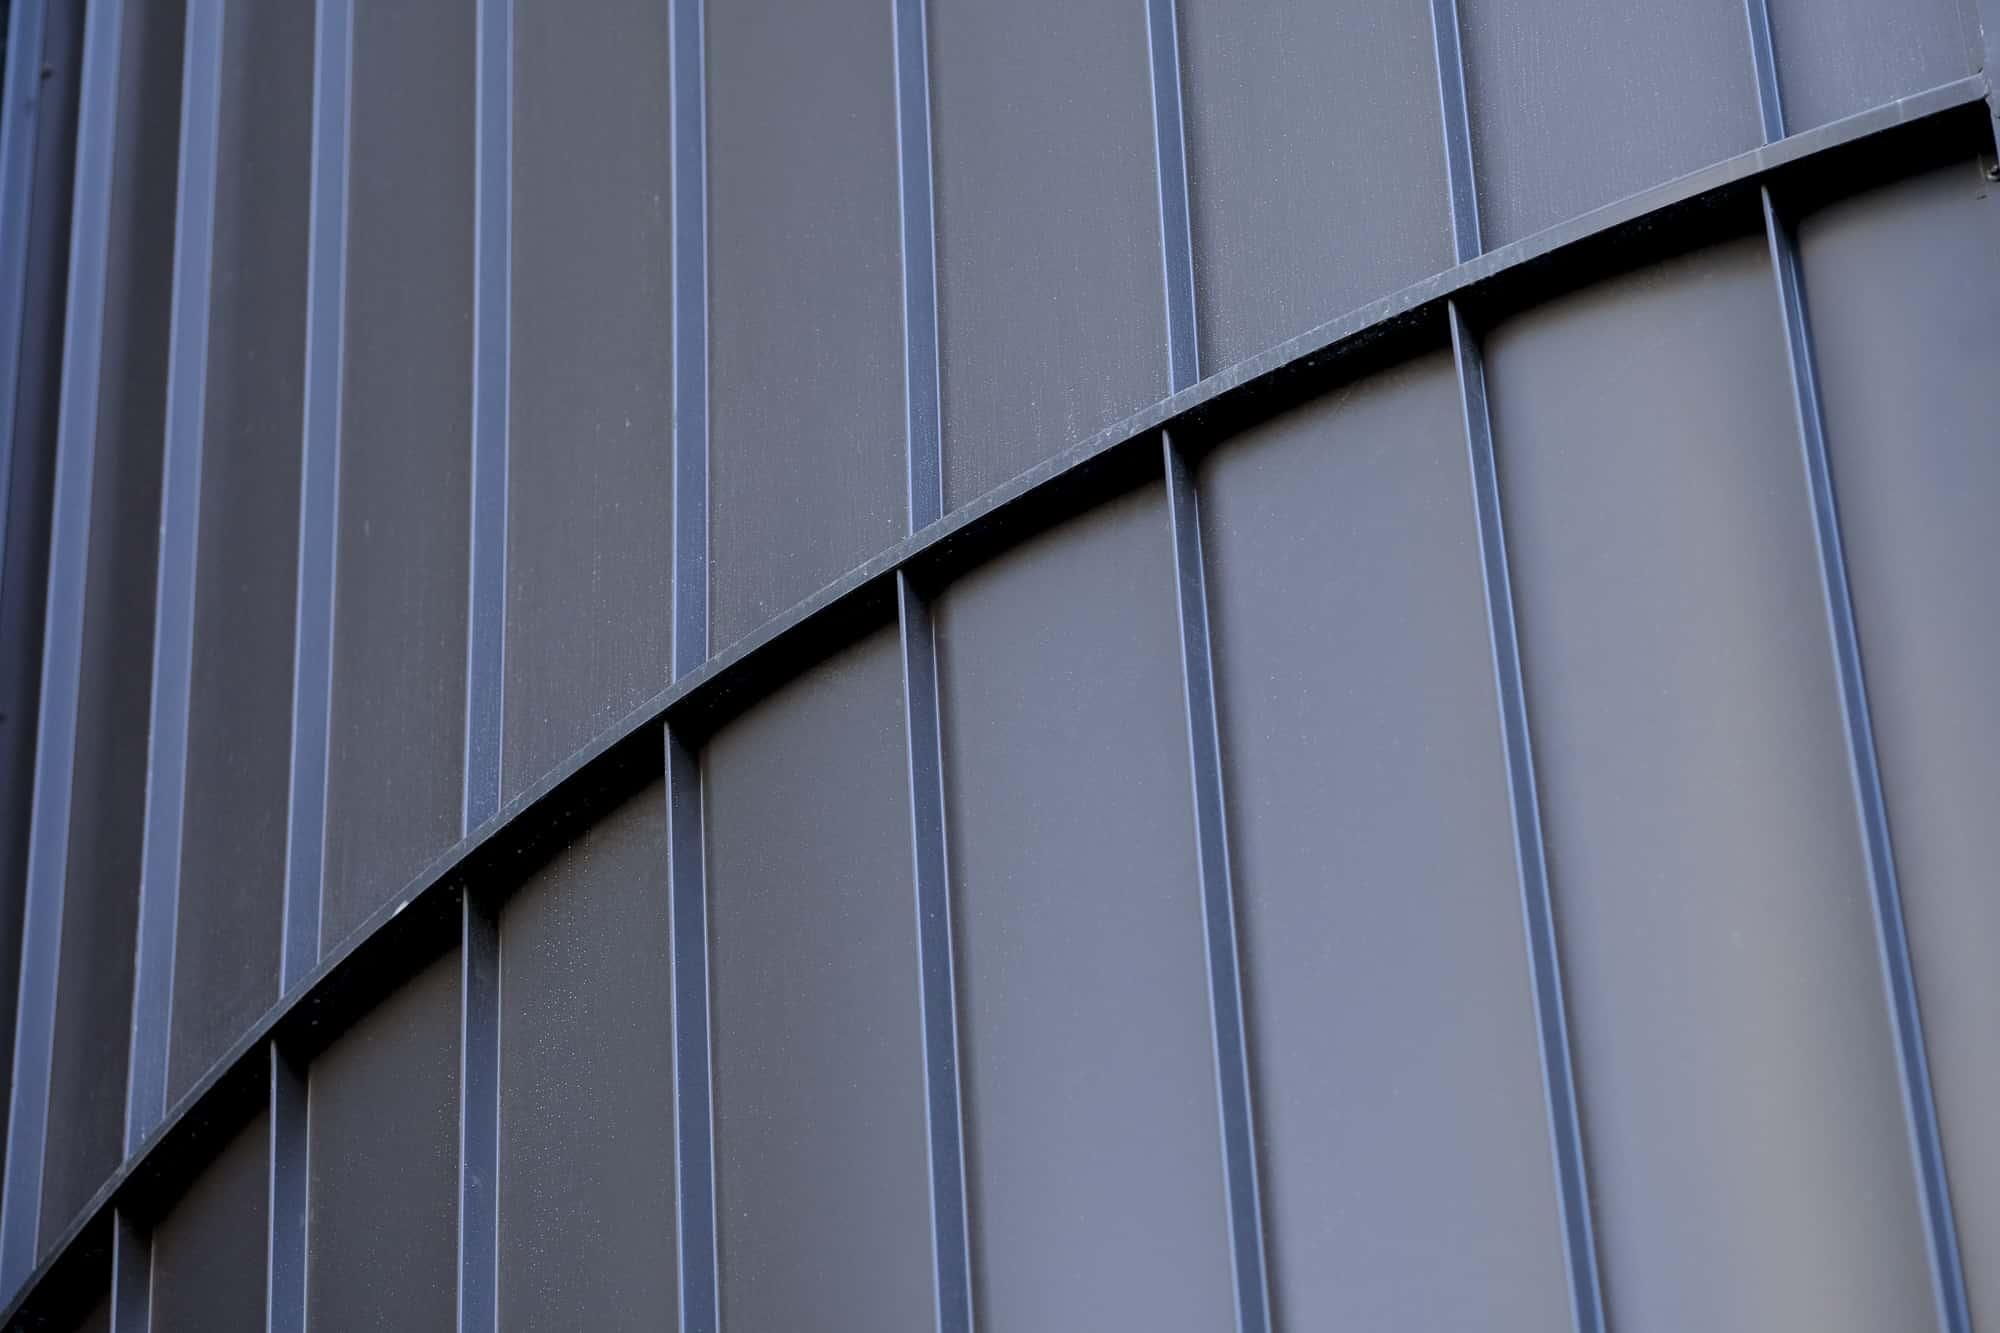 Vertical Nailstrip Panels